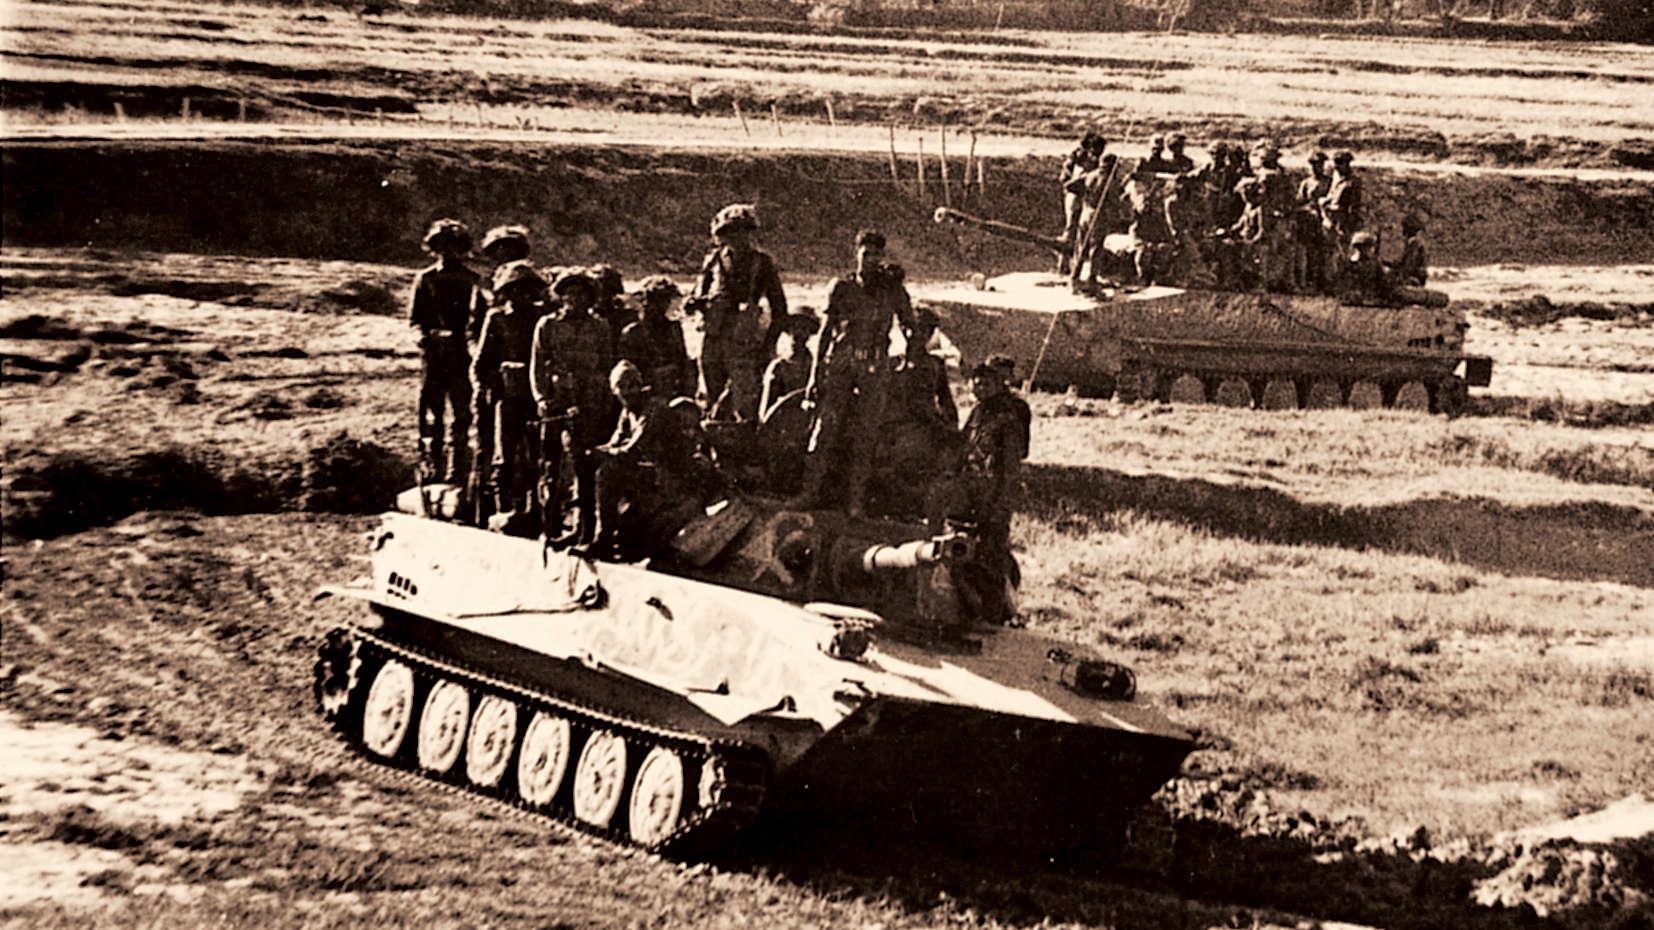 The Mukti Bahini advancing into Khulna.